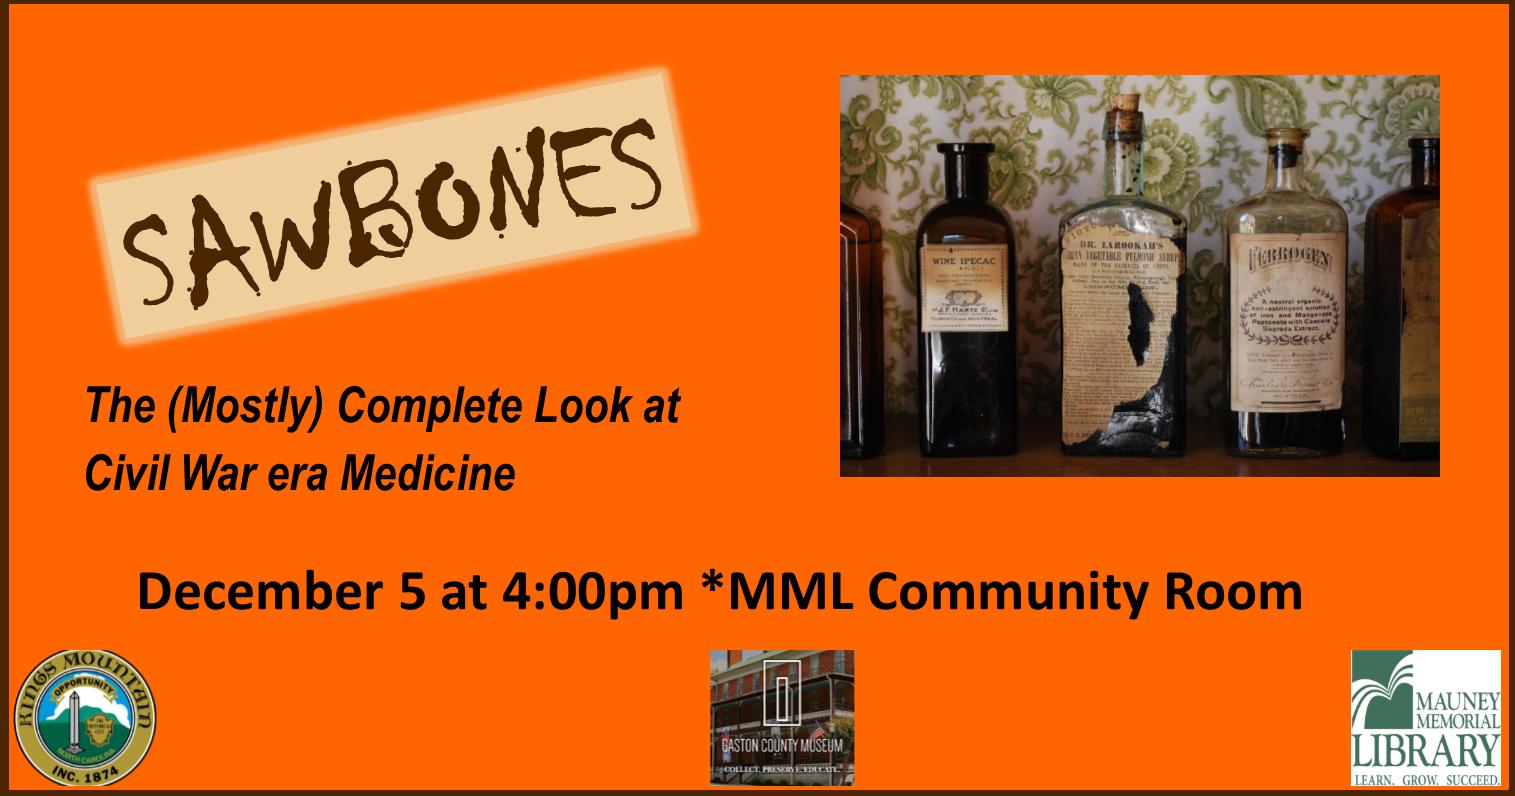 Sawbones: The (Mostly) Complete Look at Civil-War-Era Medicine